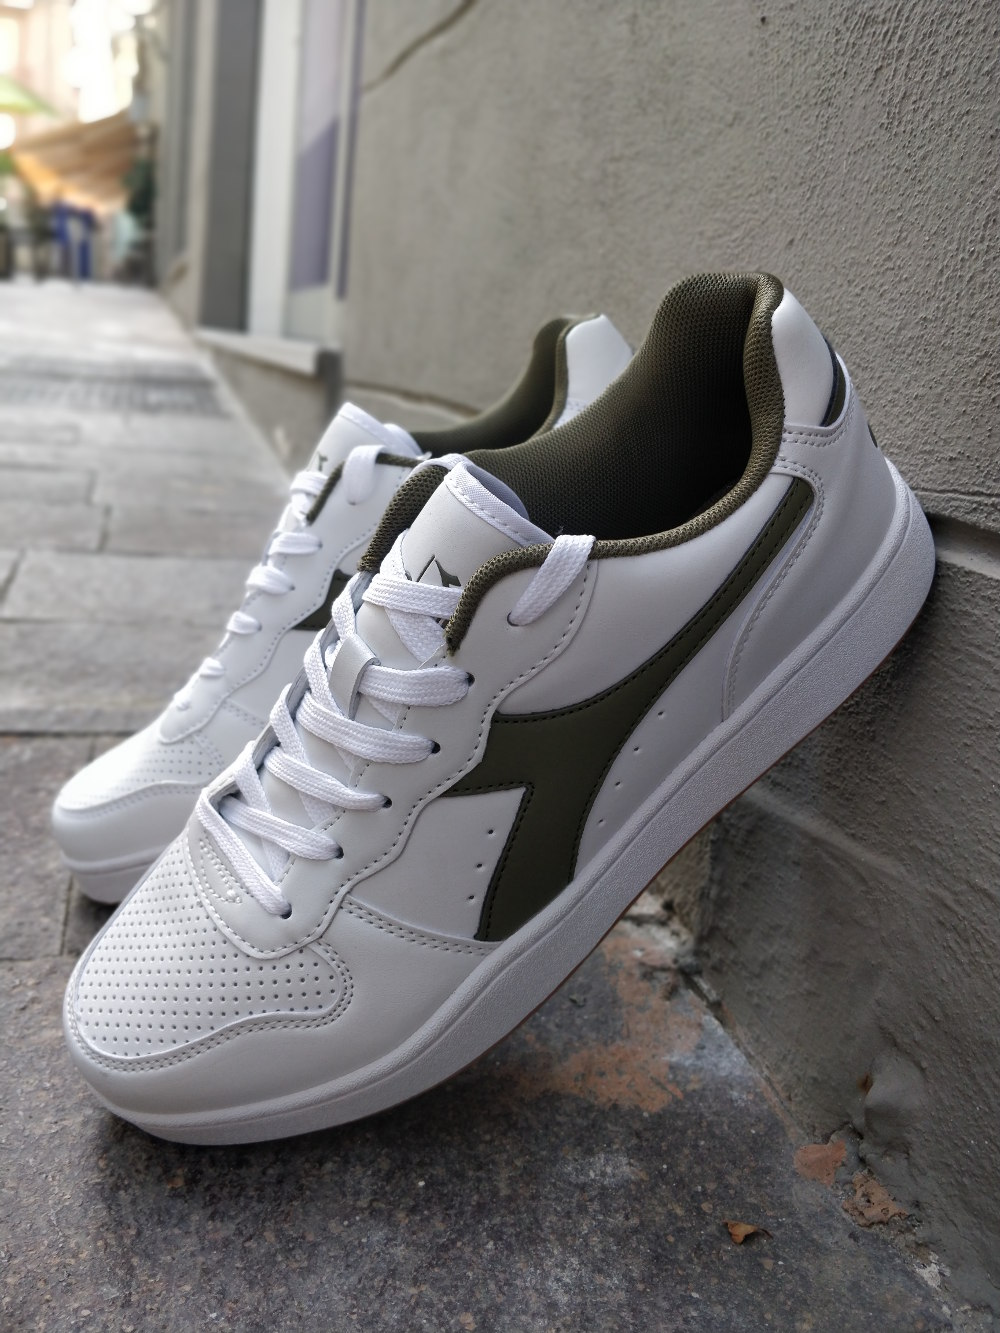 Sportswear Scarpe Diadora Lifestyle Sneakers Playground Ginnastica CXwXHq0 b9180f057db